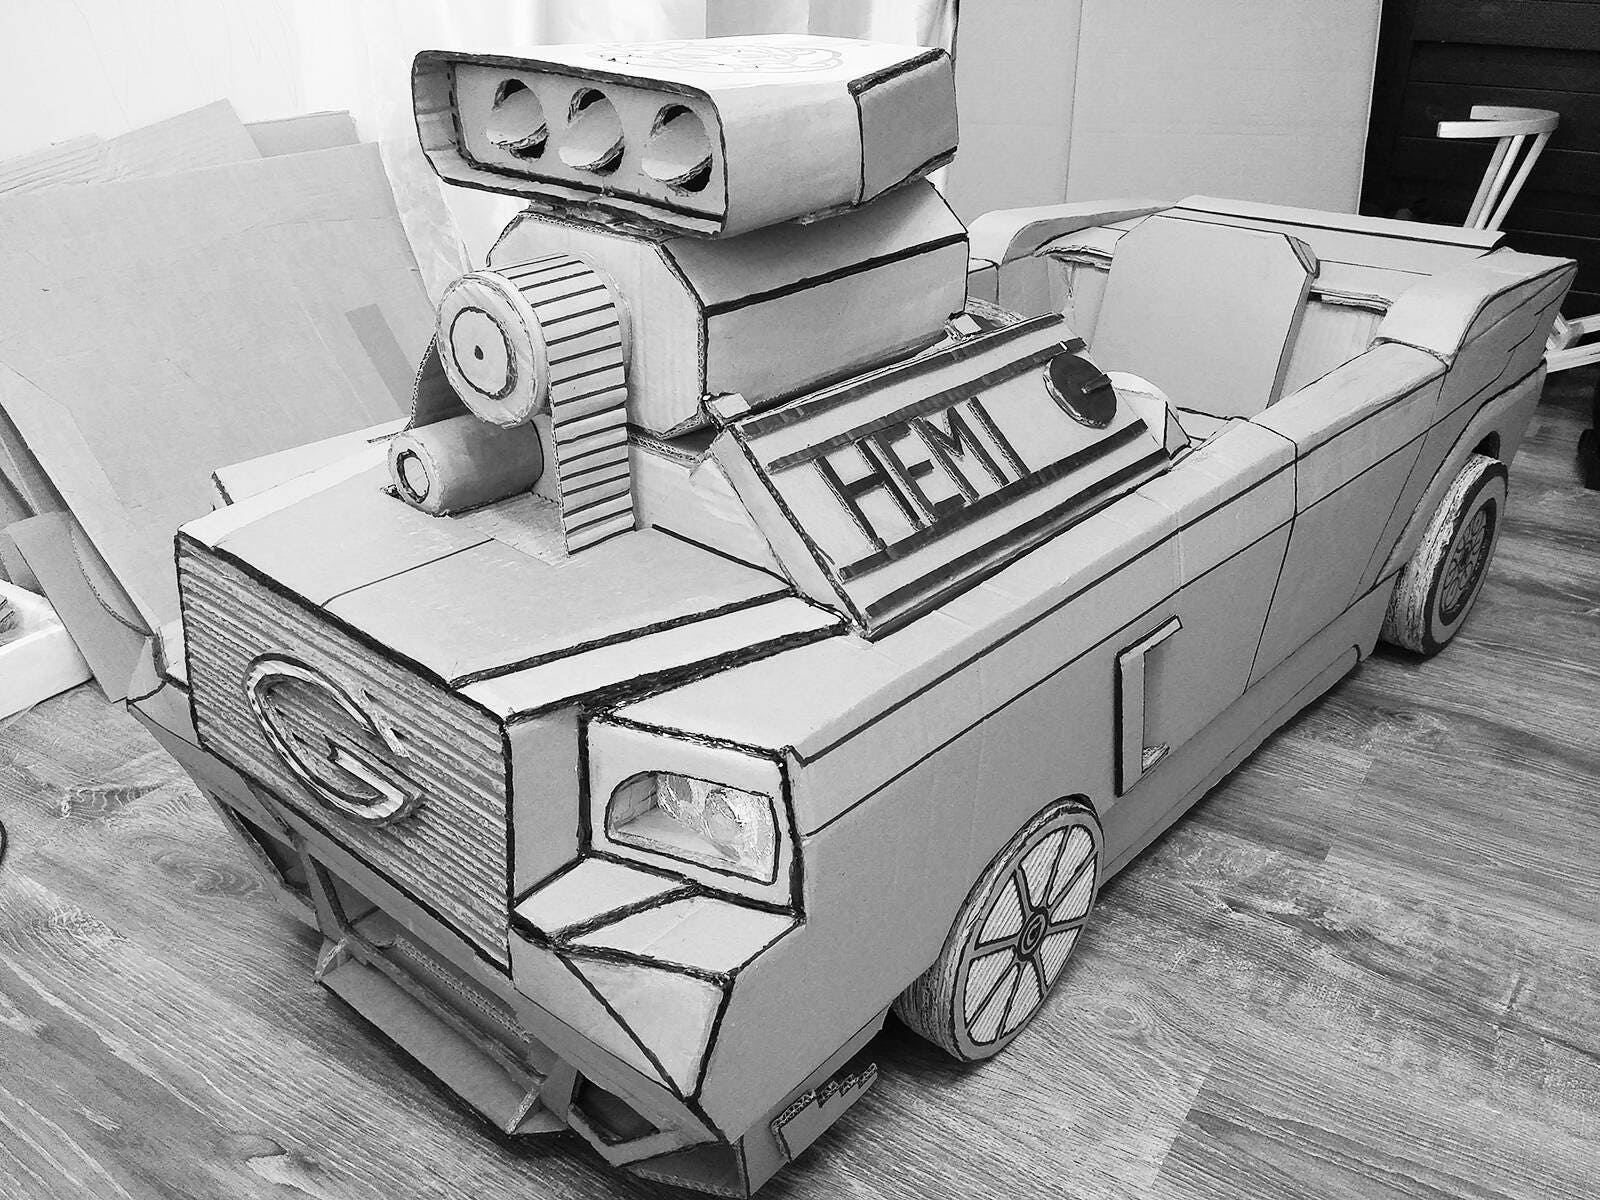 Cardboard Art Sculpture Practical Toy Car Hemi V8 Engine